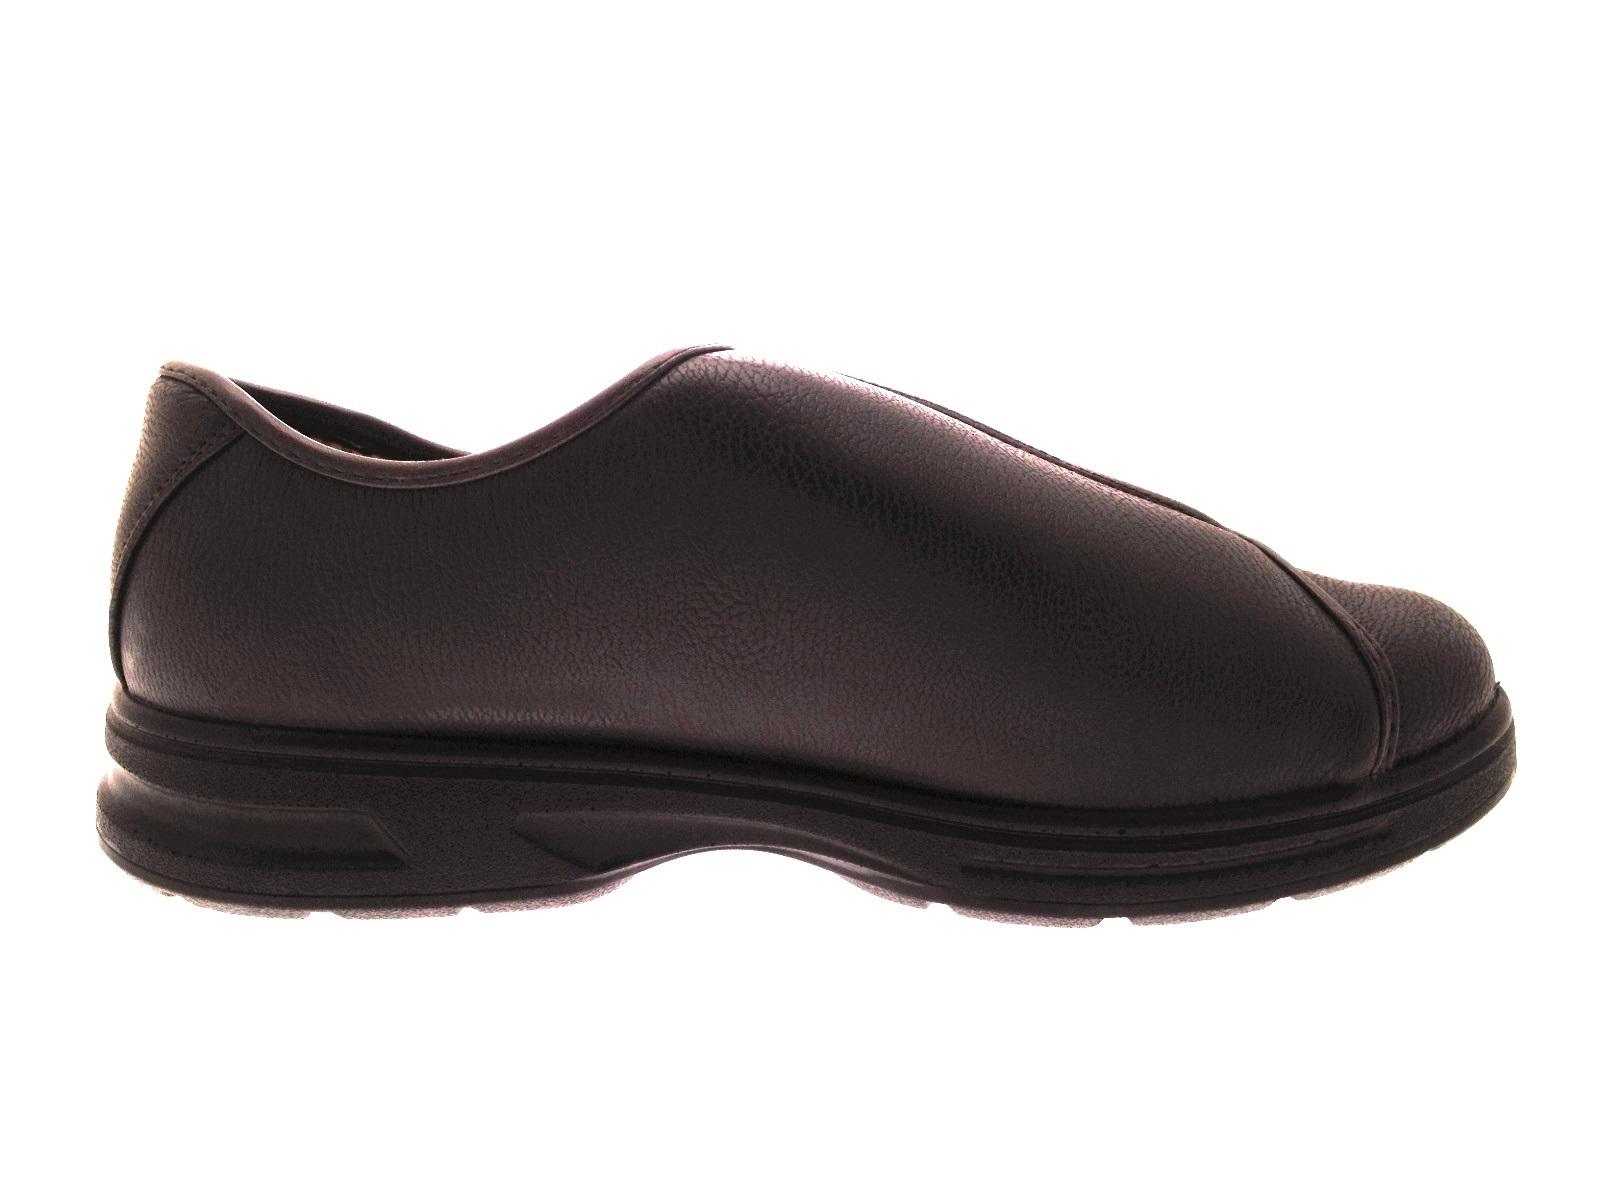 mens diabetic comfort shoes wide fit adjustable